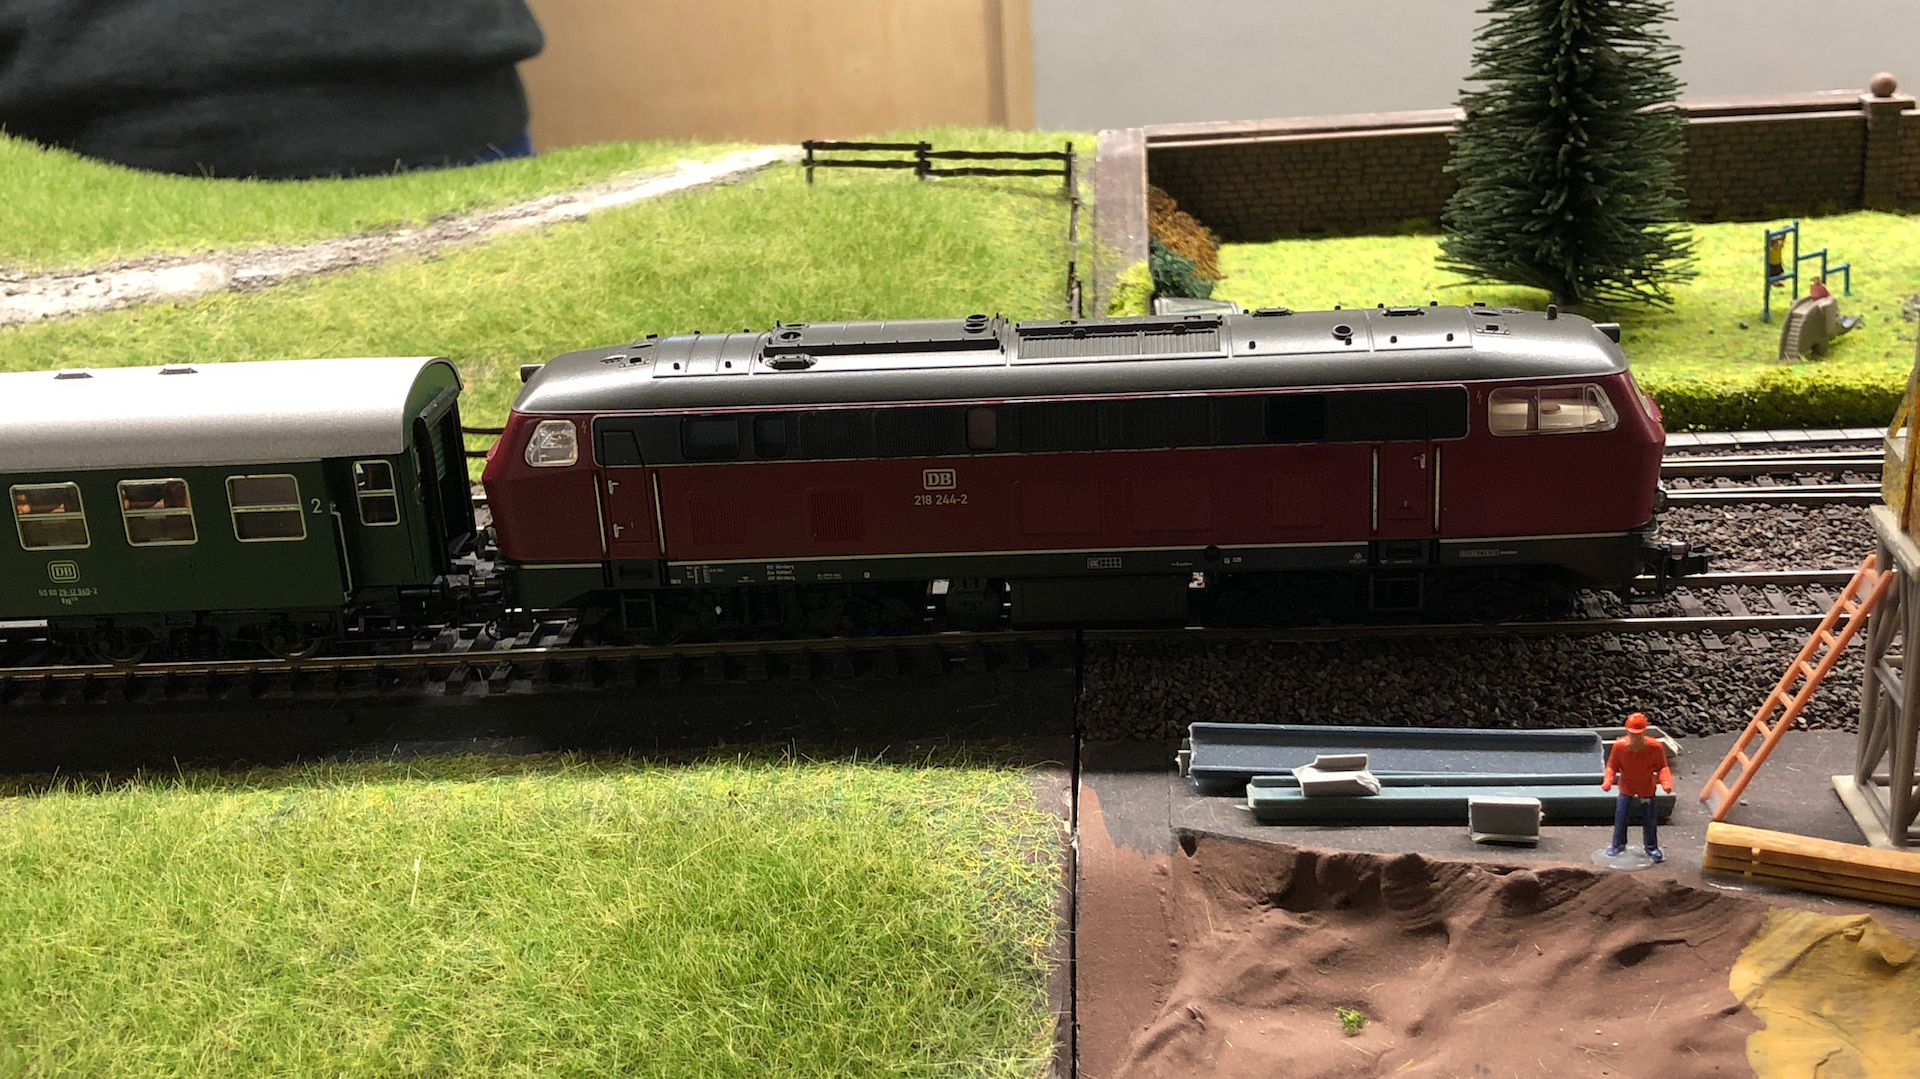 18_02_24_Schautag-Eisenbahnfreunde-Hameln_004